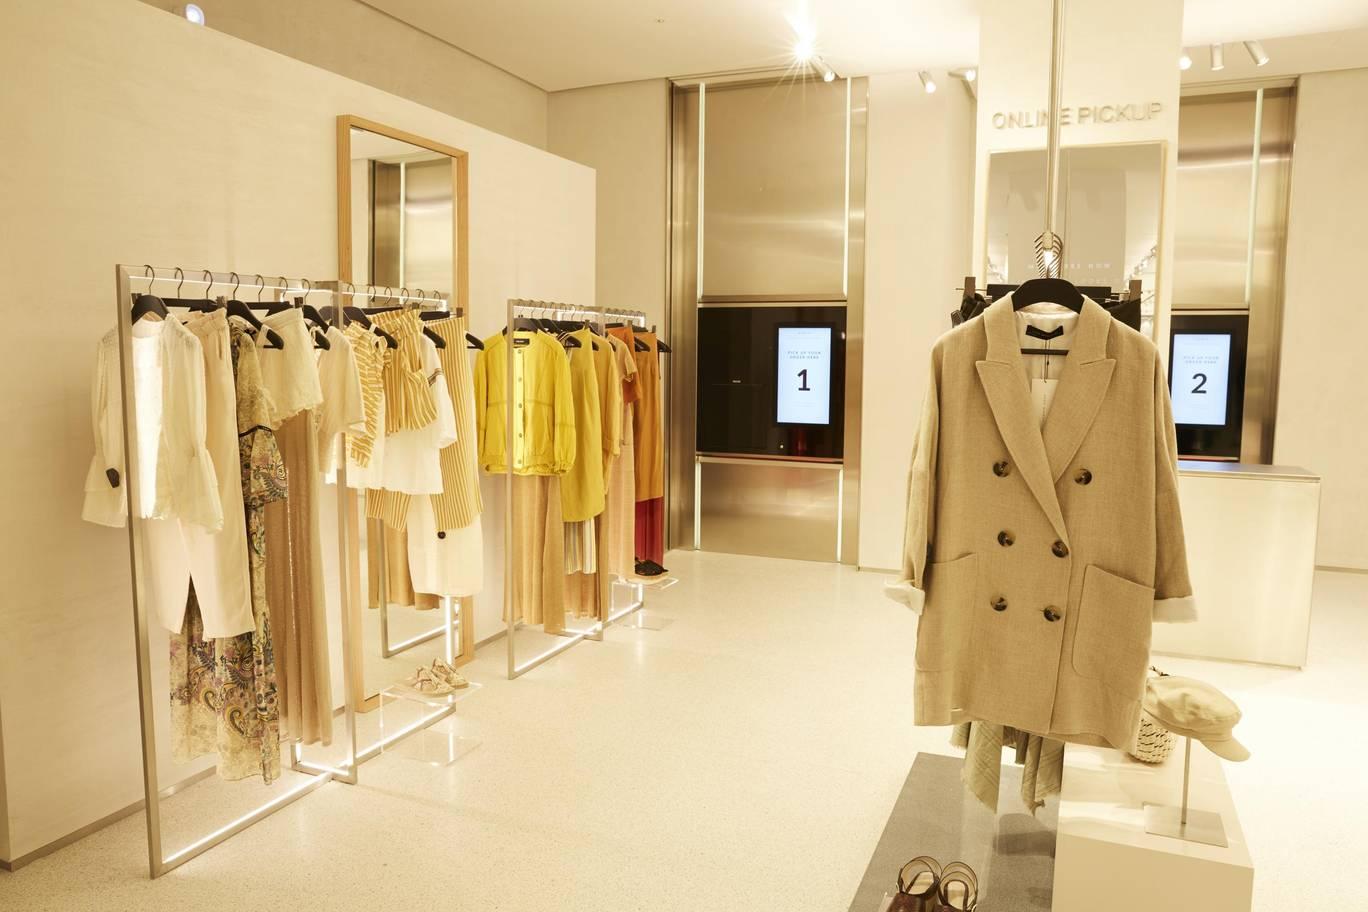 Zara Digital Age High Street Store 2